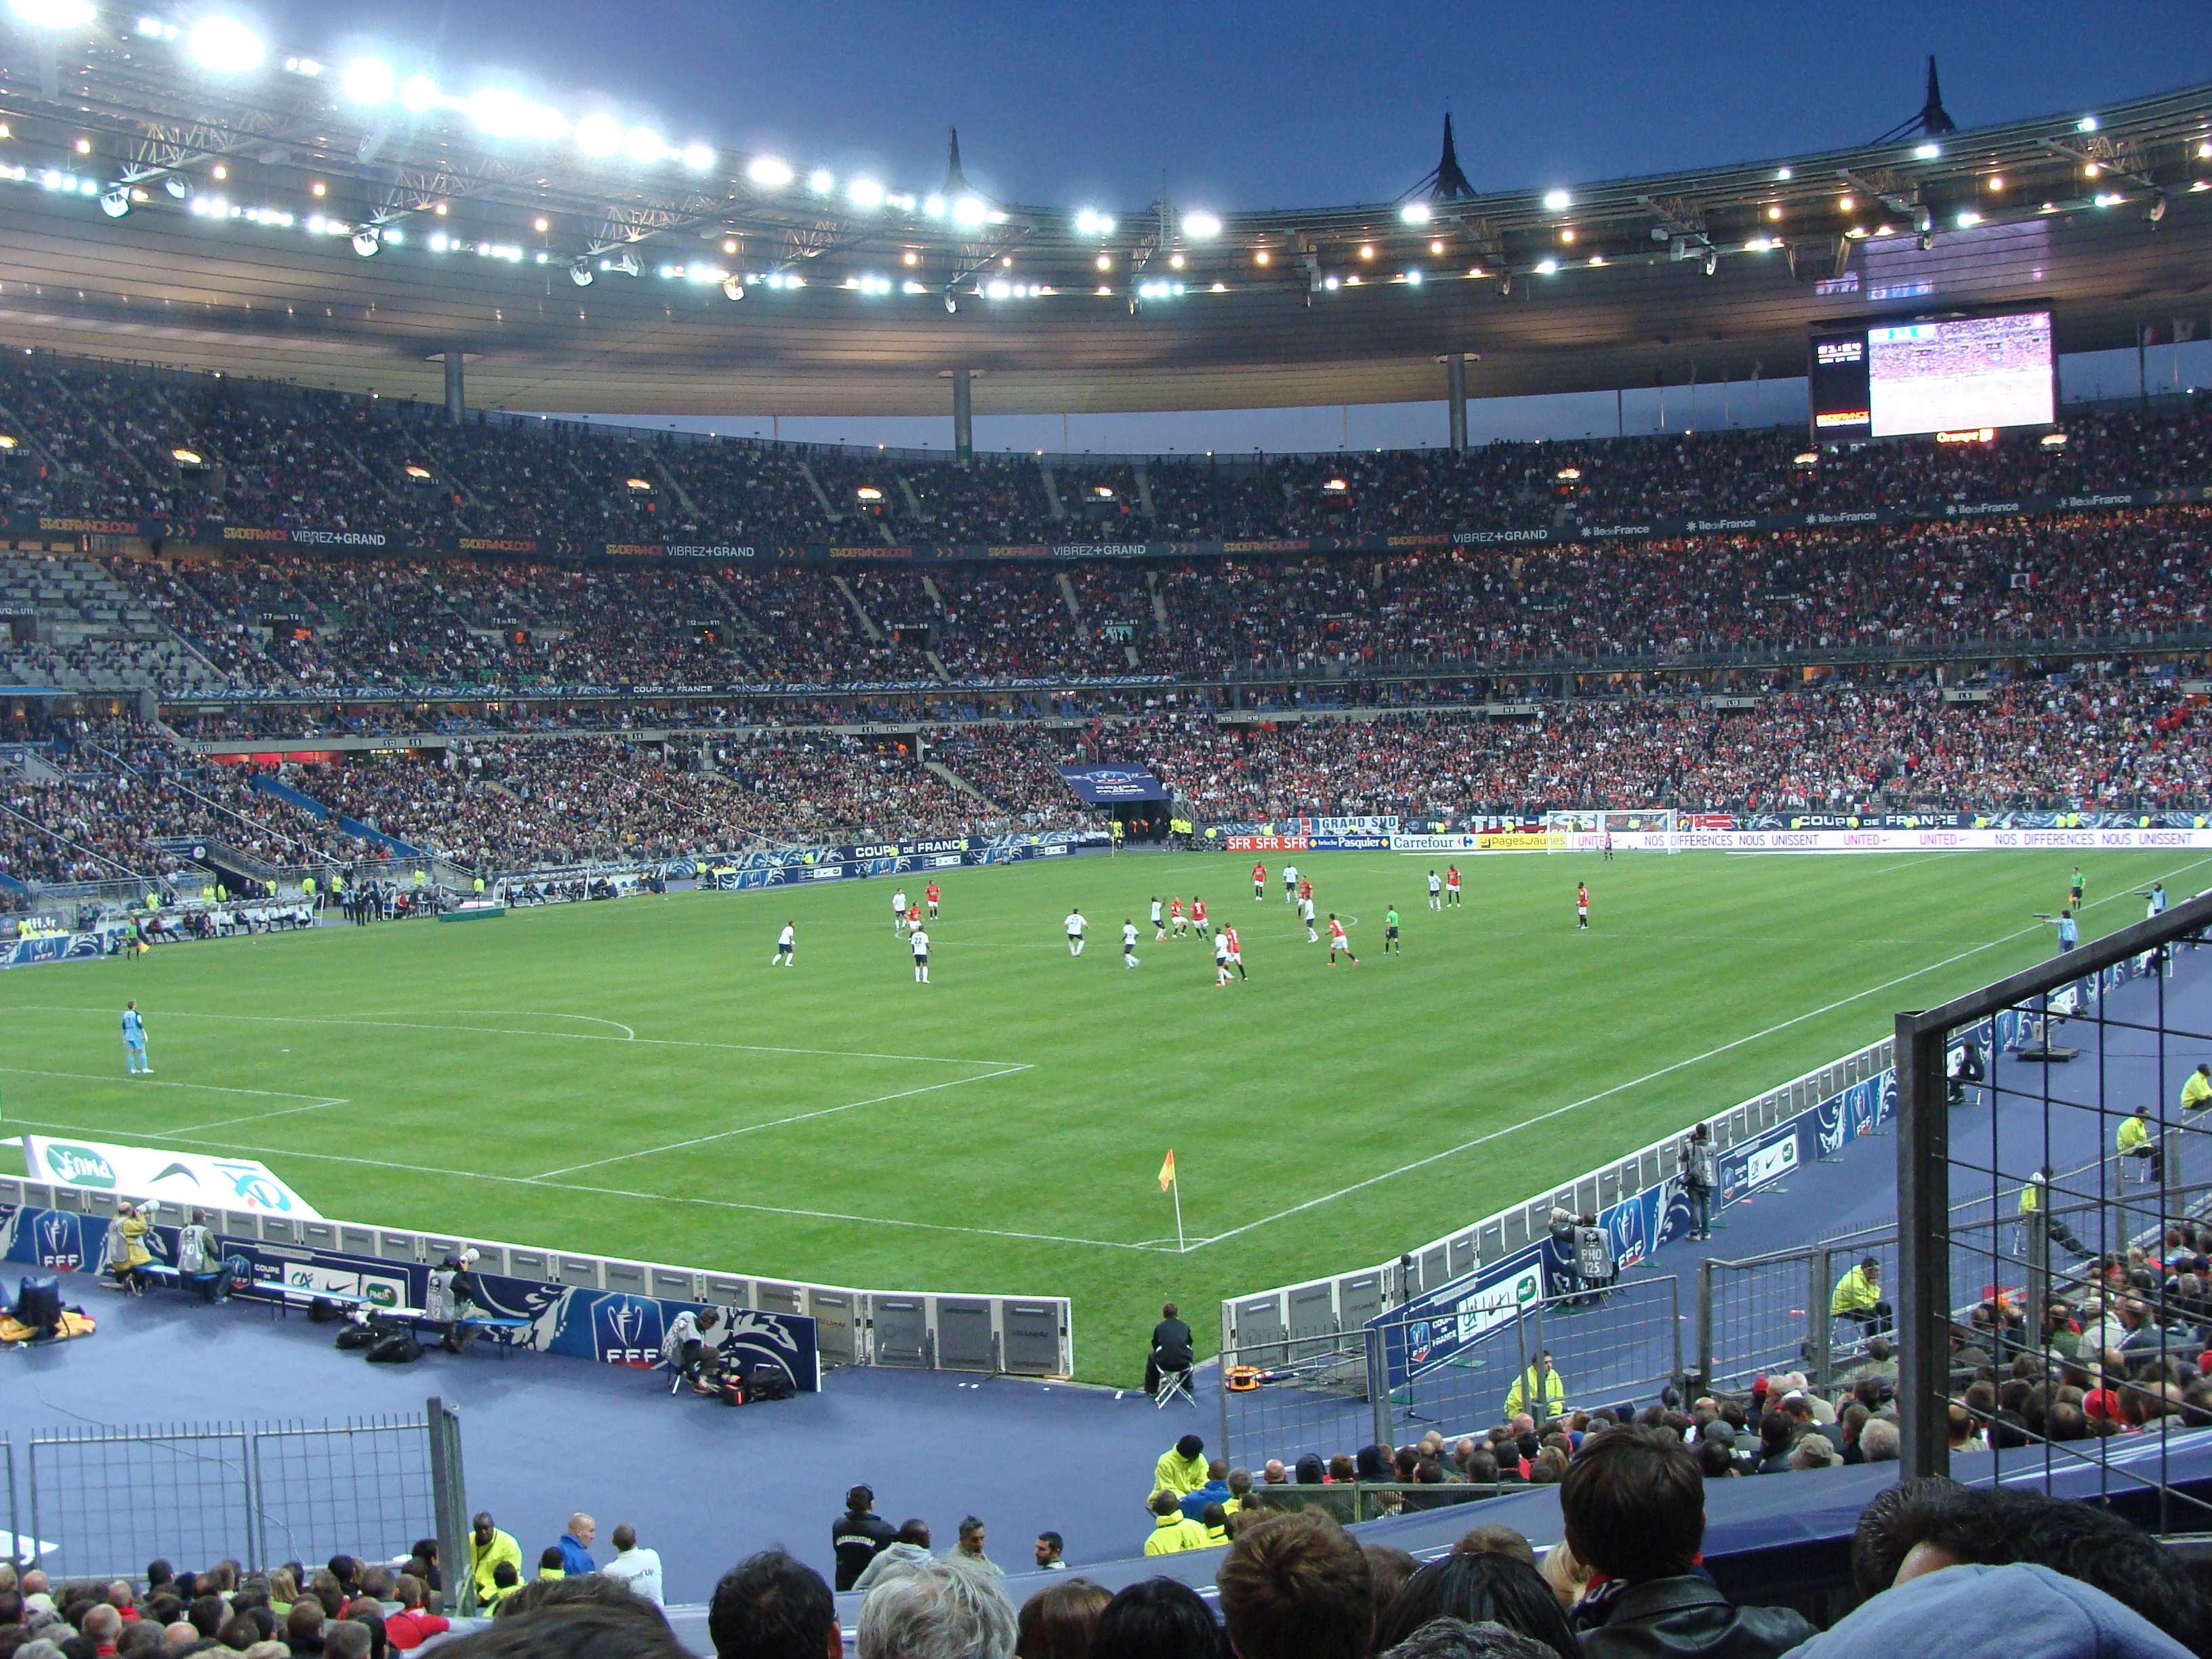 Nella foto: Stade de France situato a Saint-Denis (a poca distanza da Parigi)